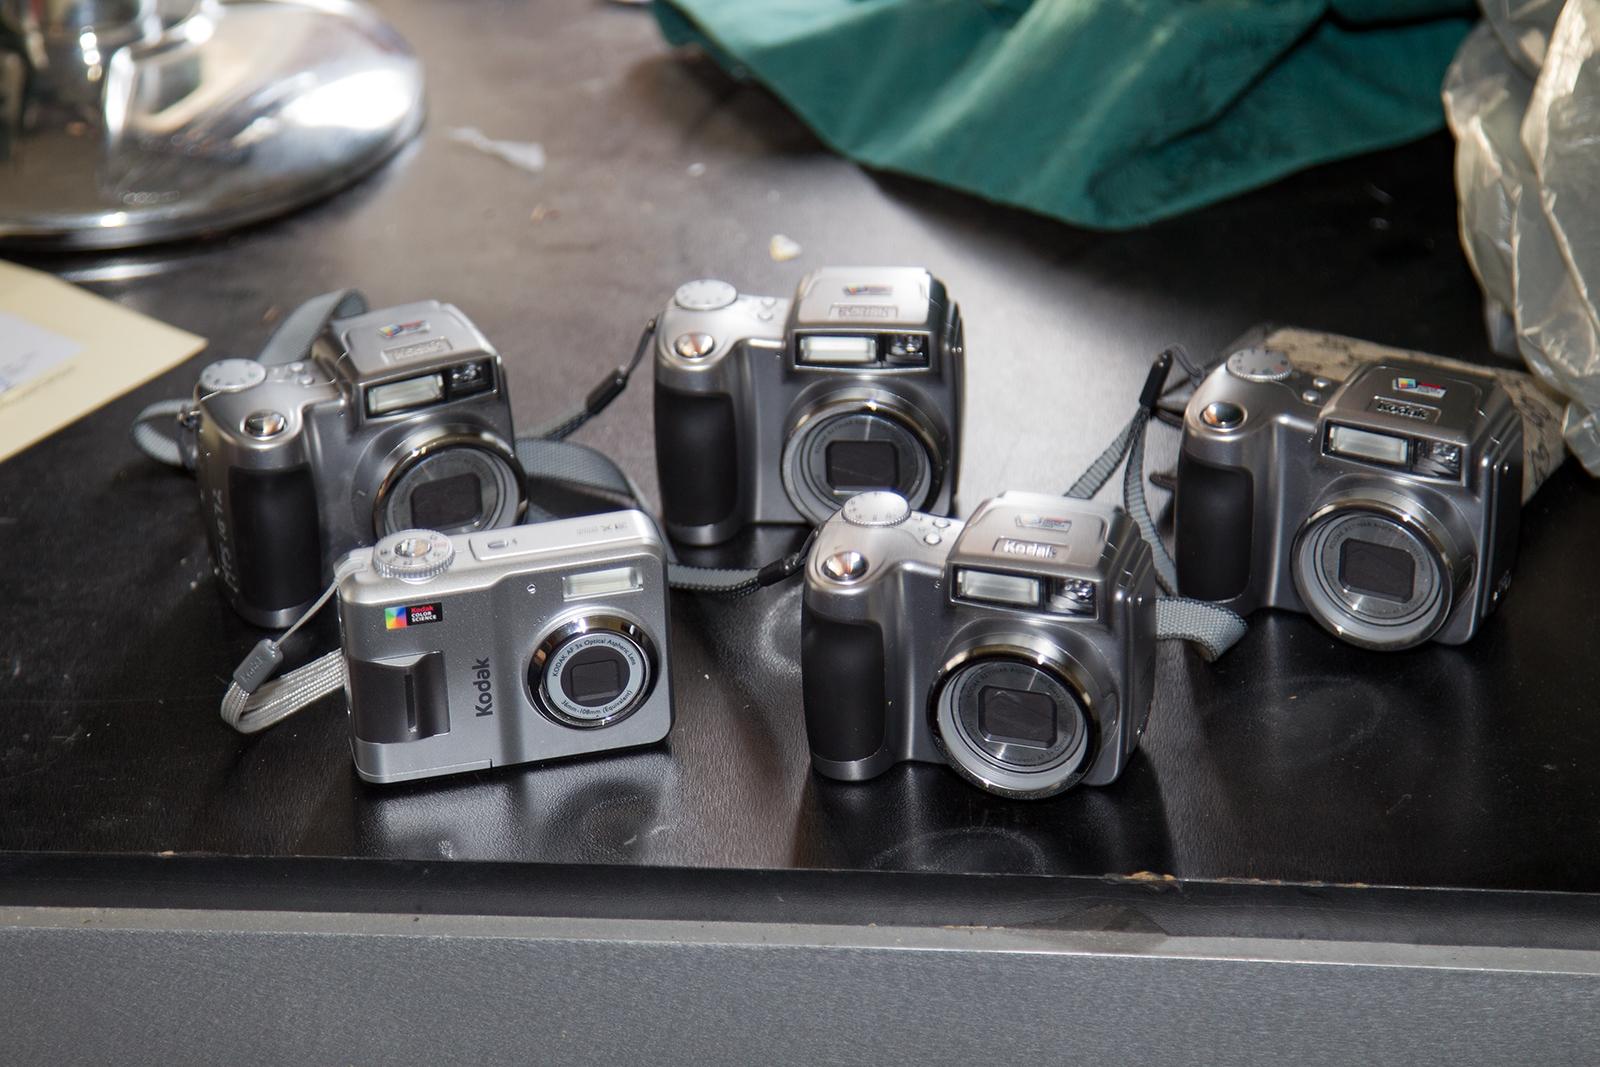 File:4× Kodak EasyShare Z700 digital cameras and 1× Kodak.